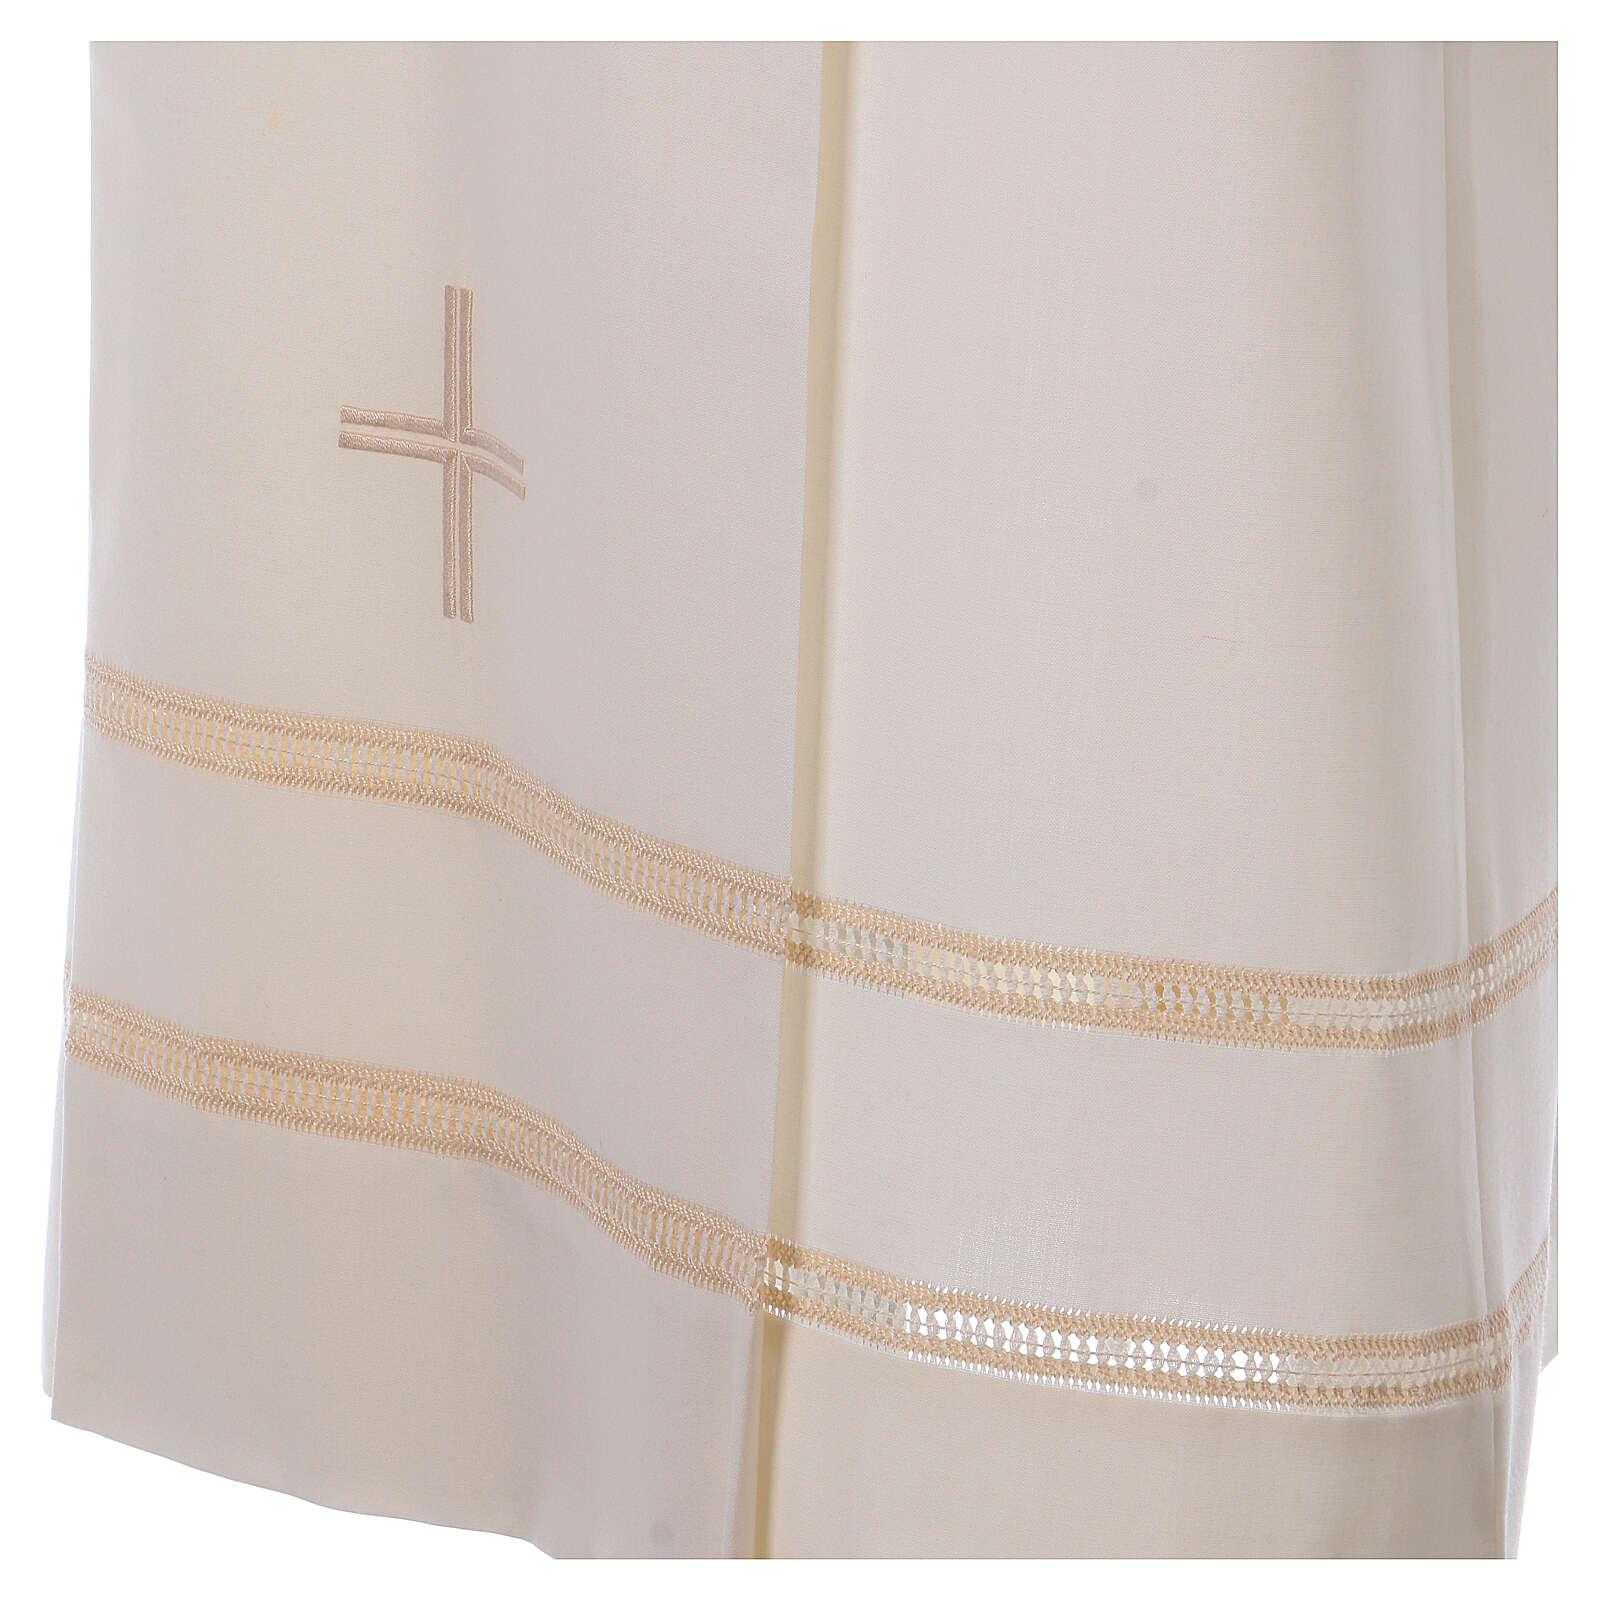 Ivory alb 55% alb 45% polyester front zipper 4